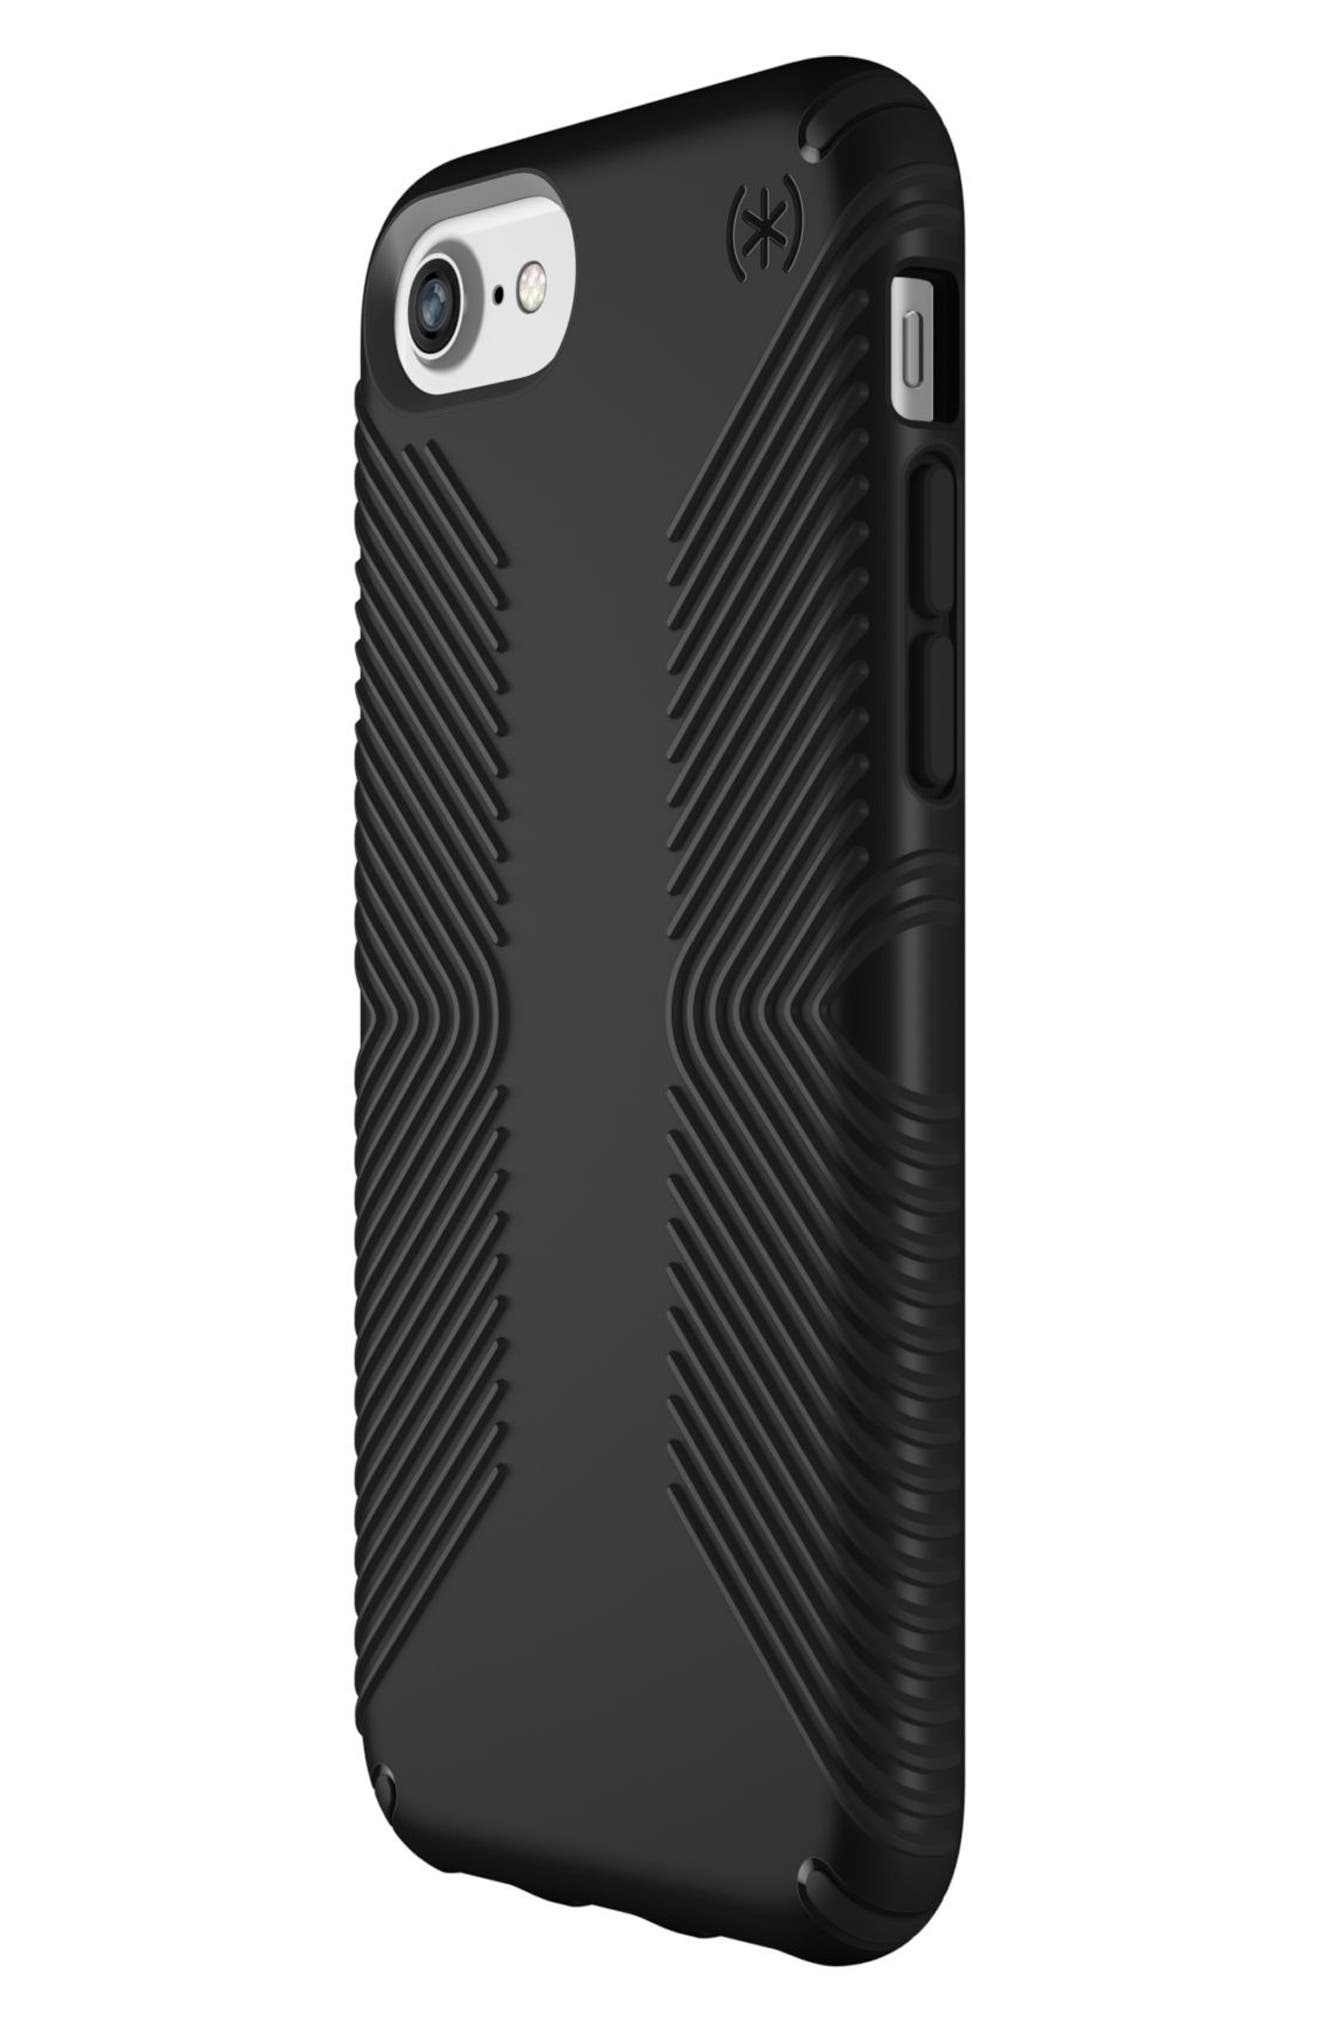 SPECK, Grip iPhone 6/6s/7/8 Case, Alternate thumbnail 7, color, 001